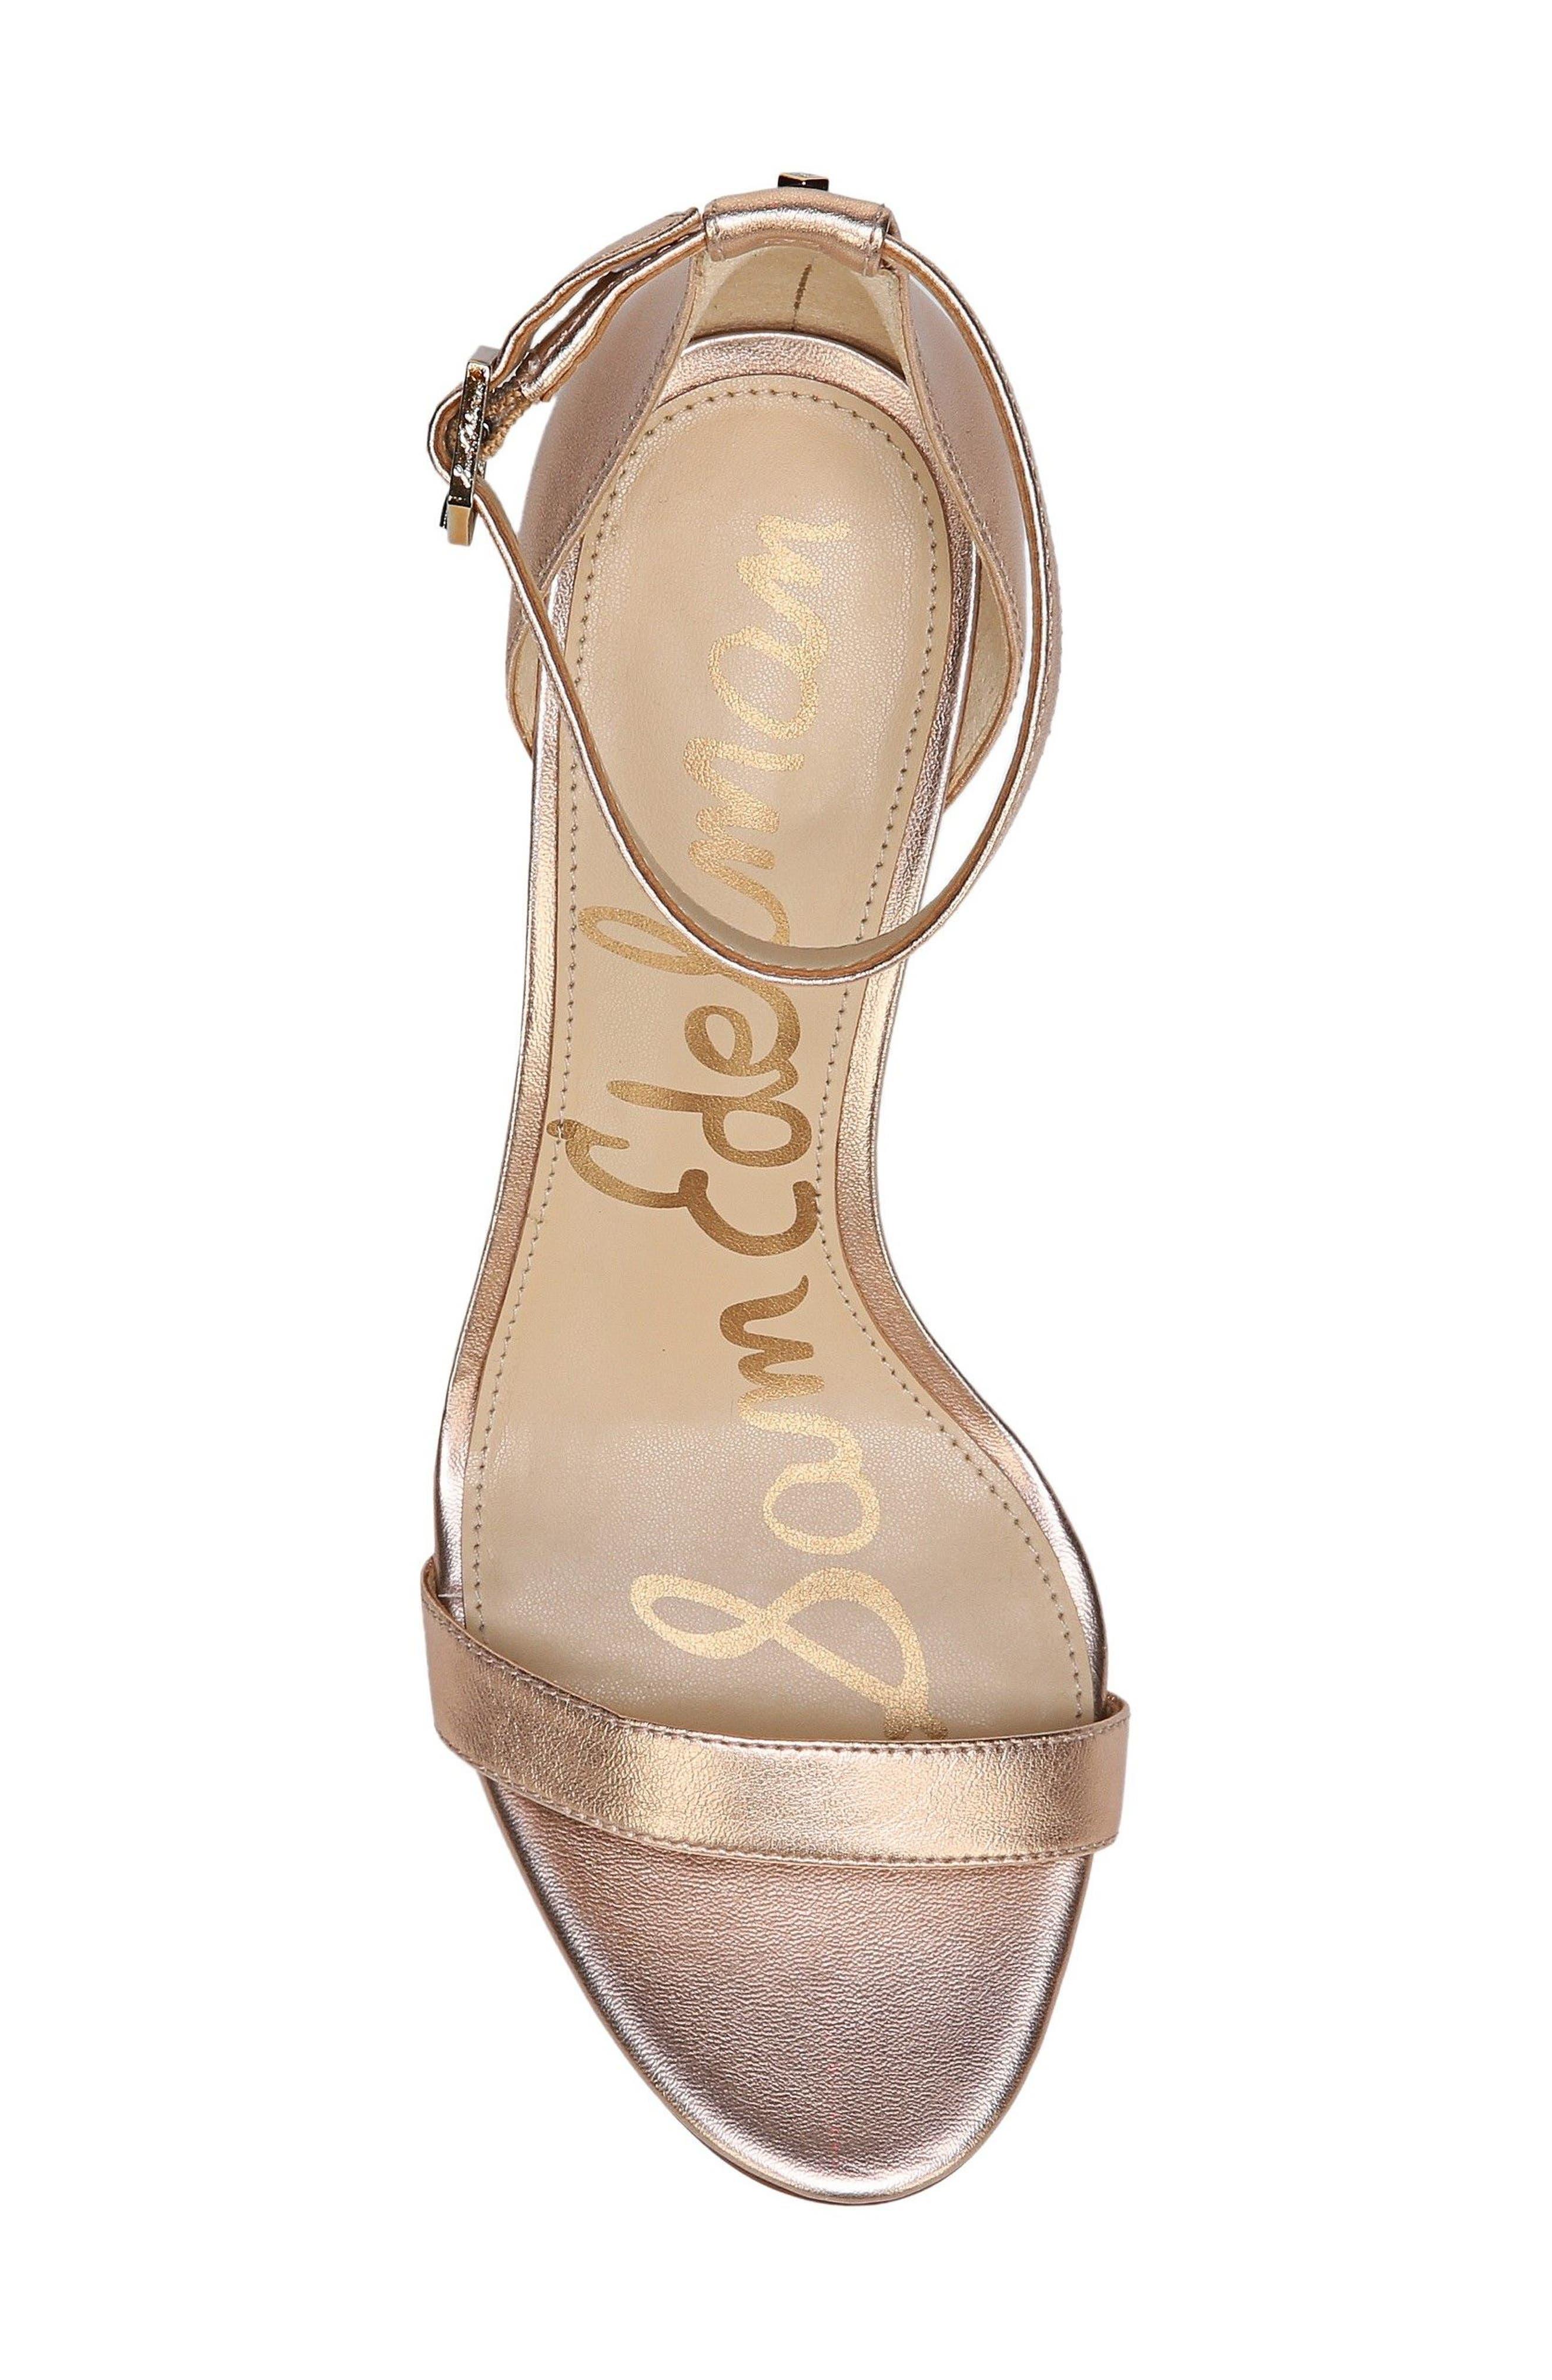 ,                             'Patti' Ankle Strap Sandal,                             Alternate thumbnail 172, color,                             220